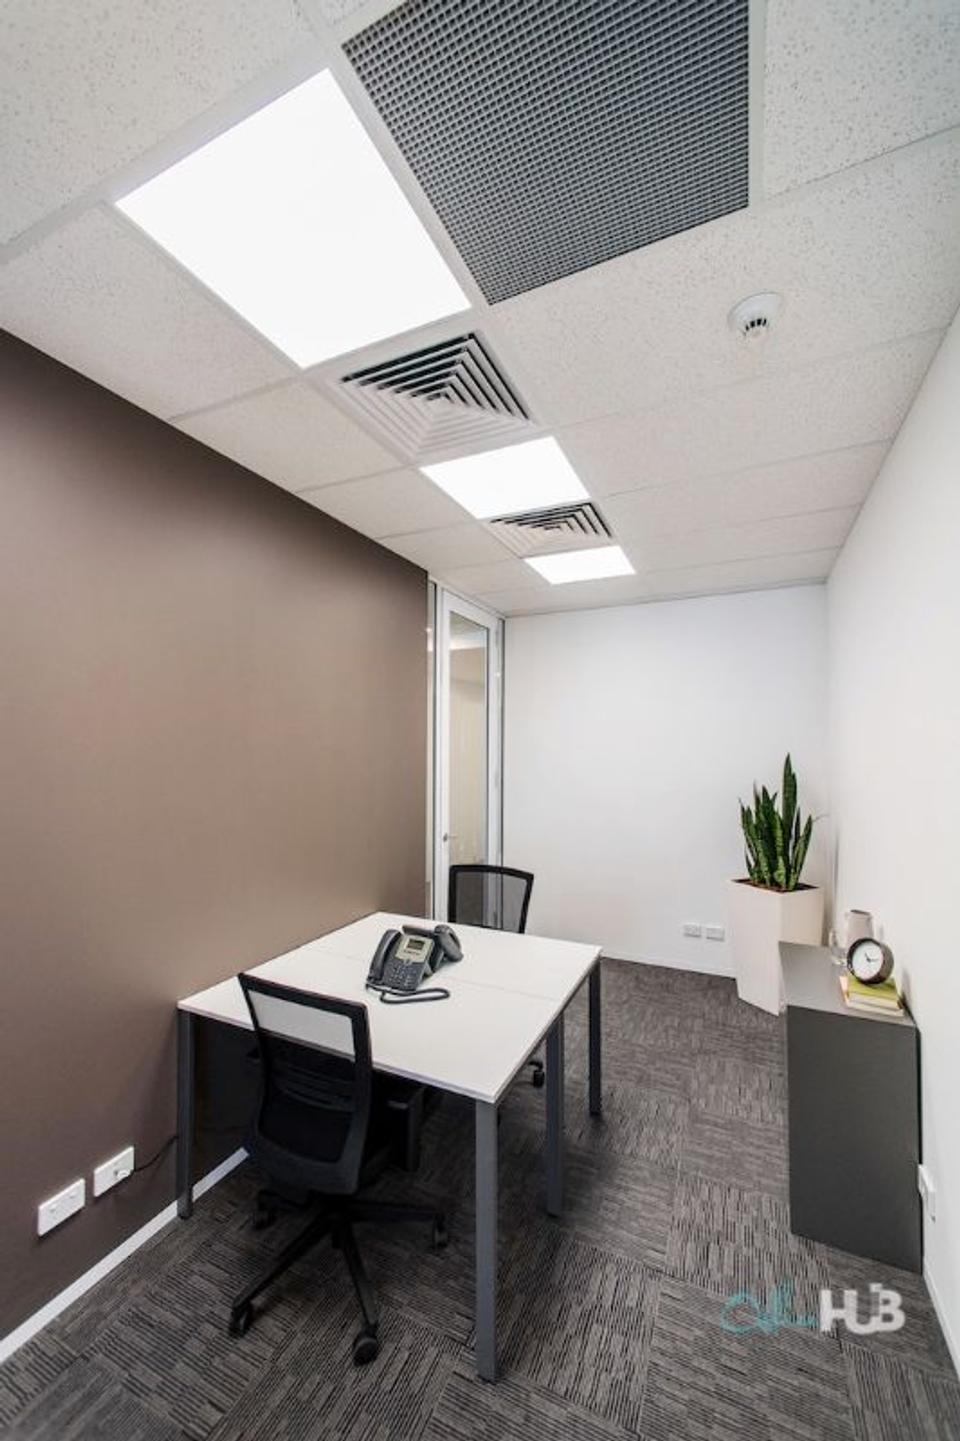 6 Person Private Office For Lease At 355 Scarborough Beach, Osborne Park, WA, 6017 - image 3